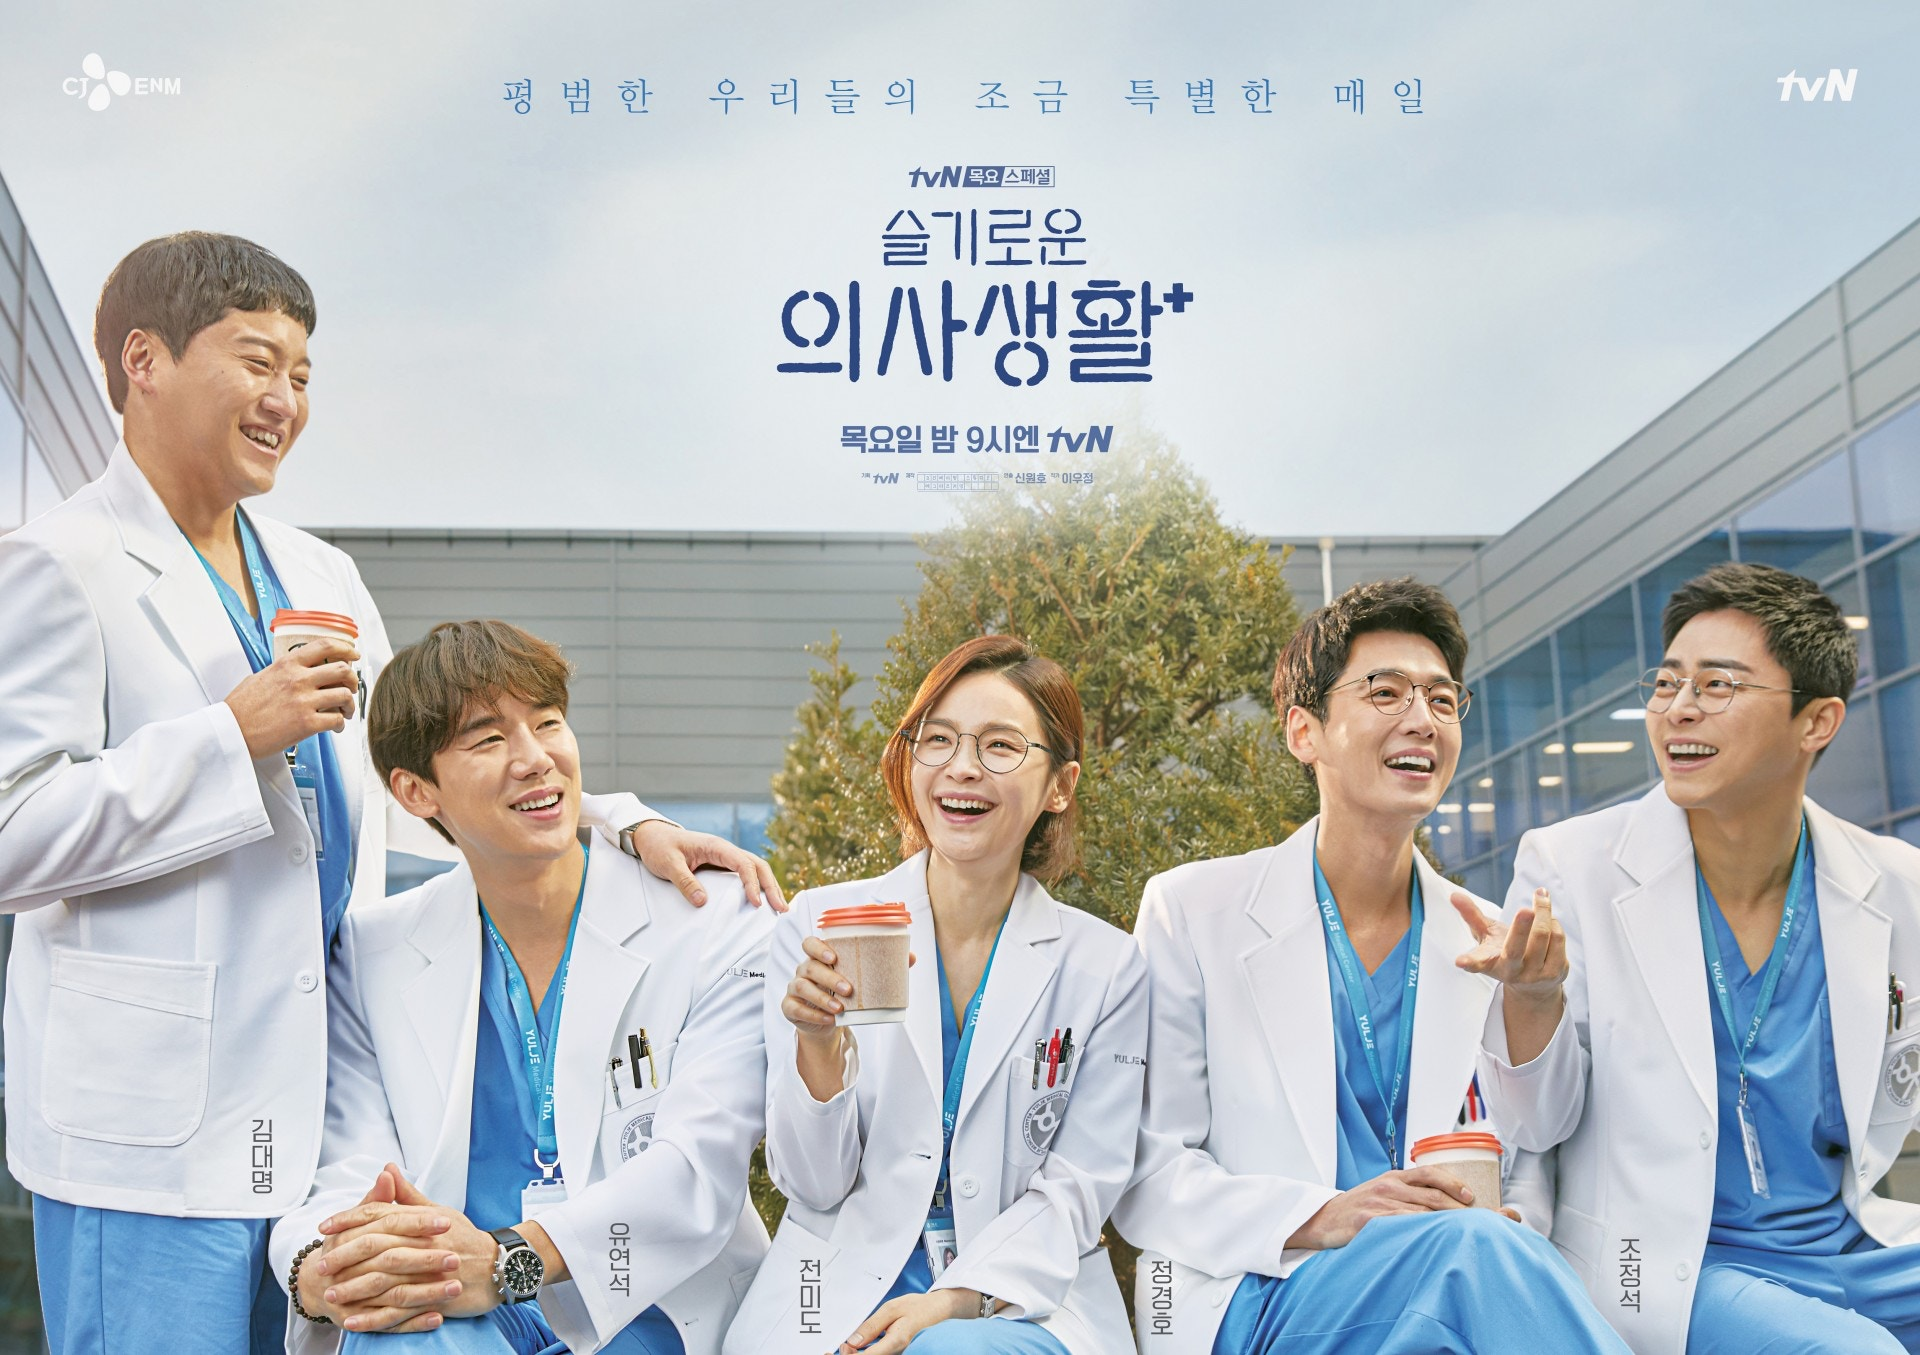 poster phim bác sĩ Hospital Playlist